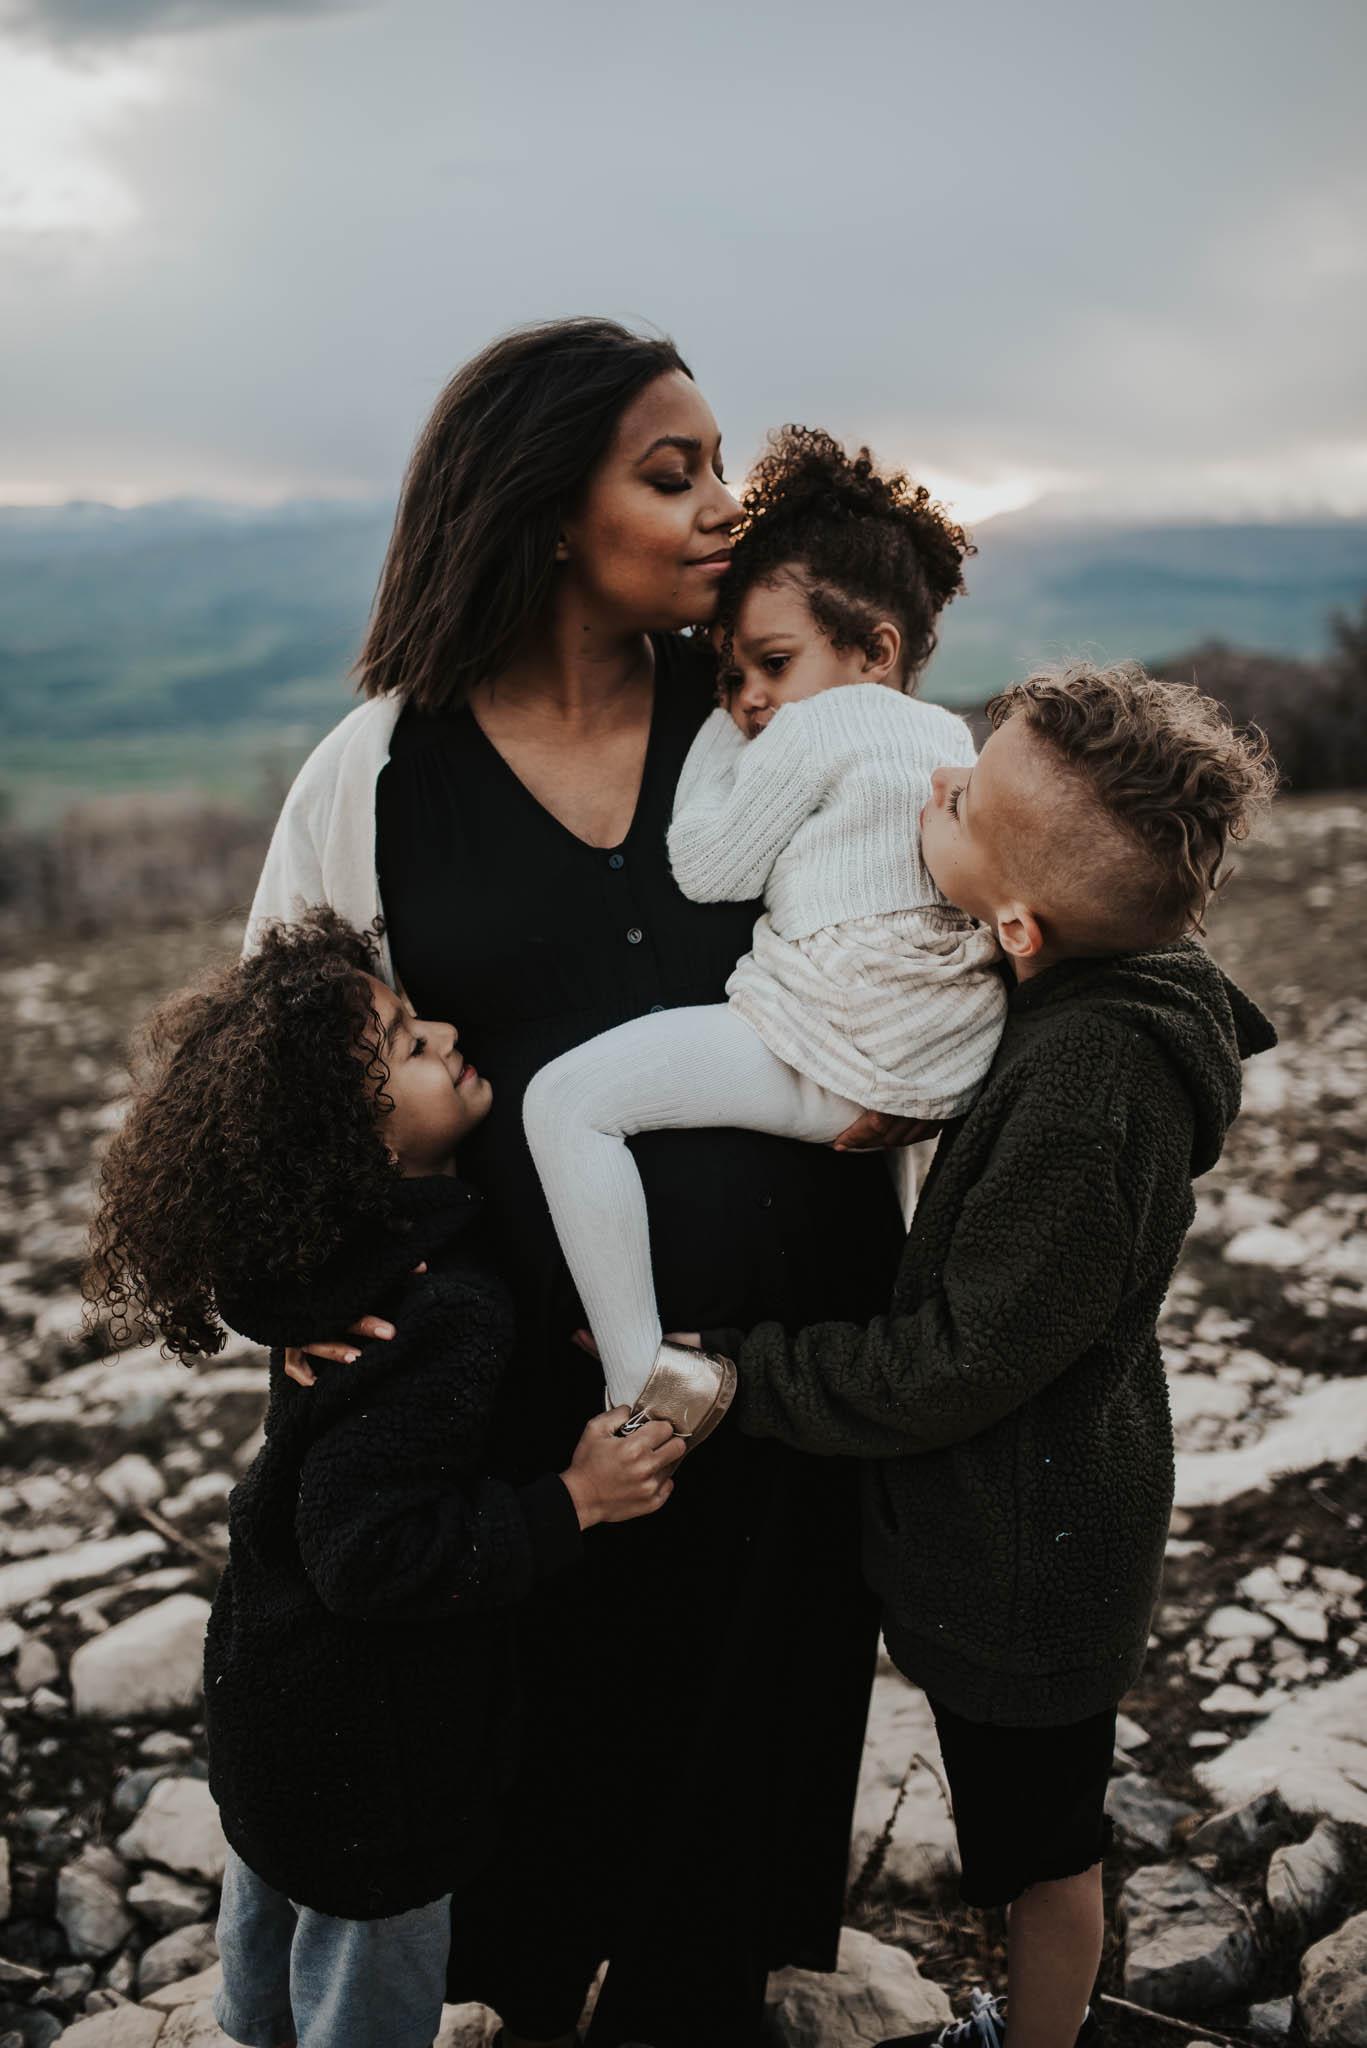 Intimate Motherhood, Fairview, Utah.